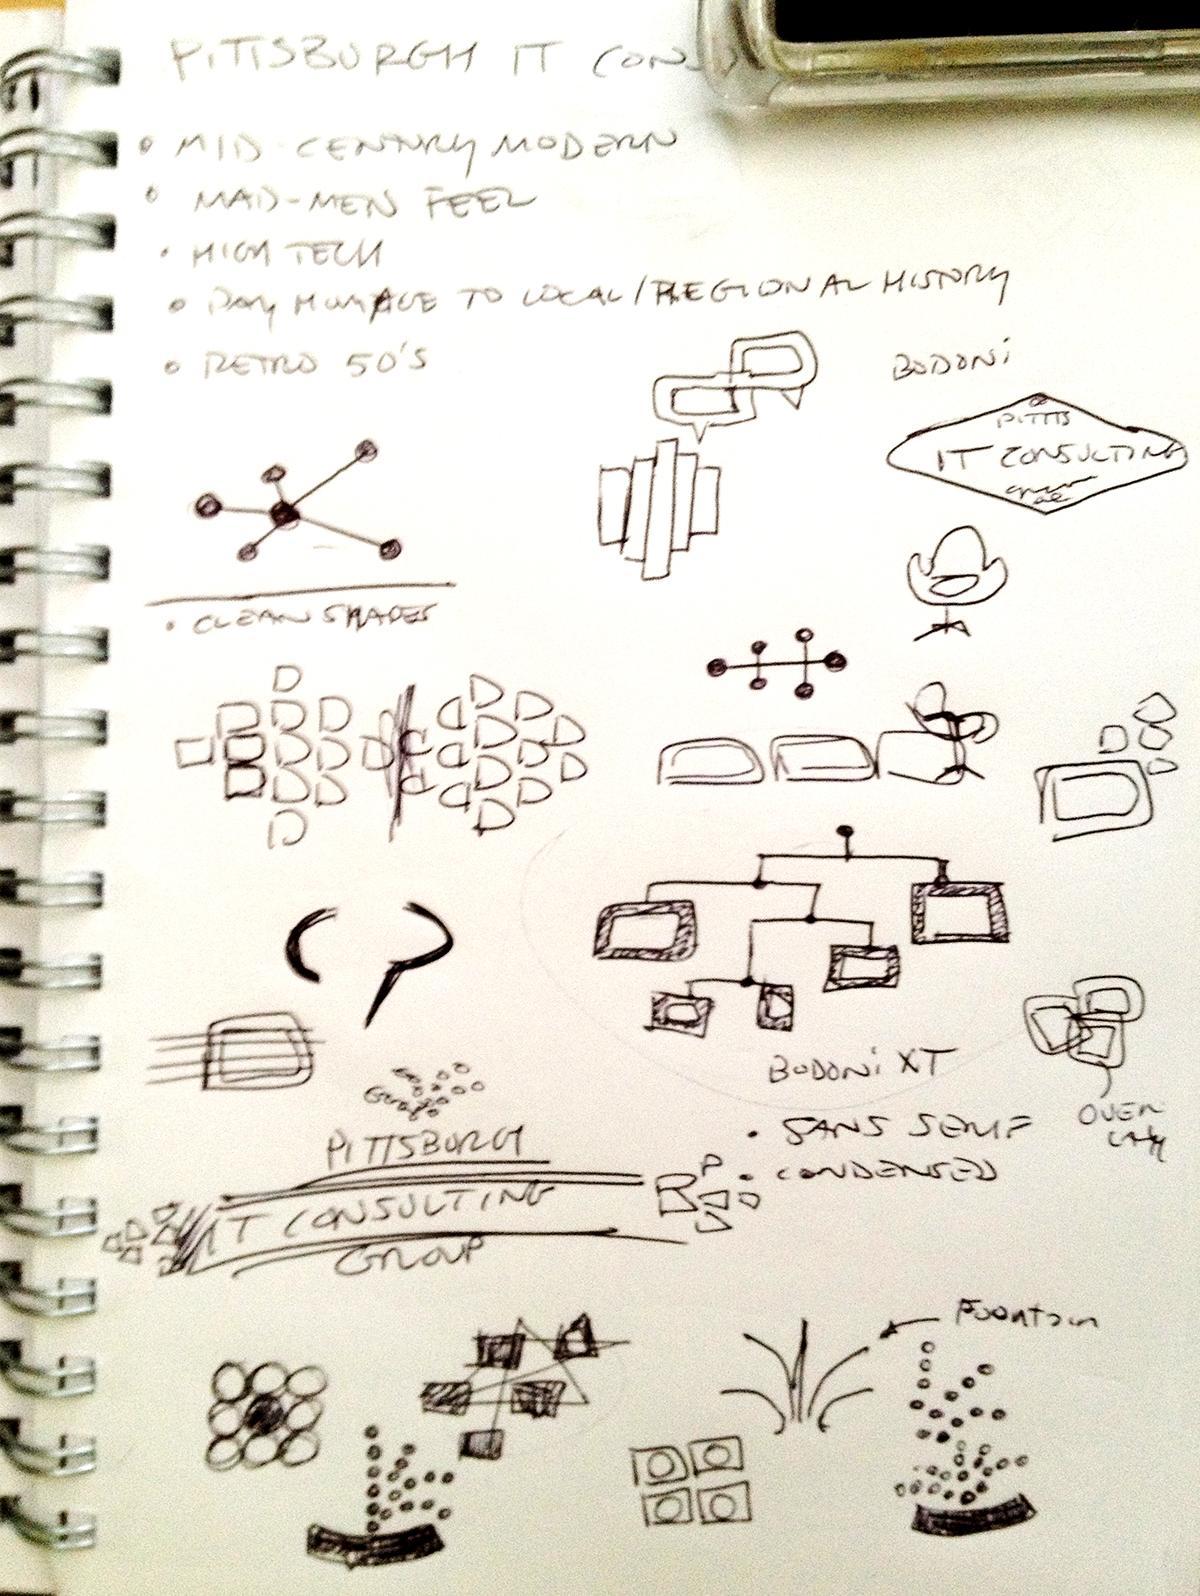 Pittsburgh IT Consulting Group Sketchbook Studies